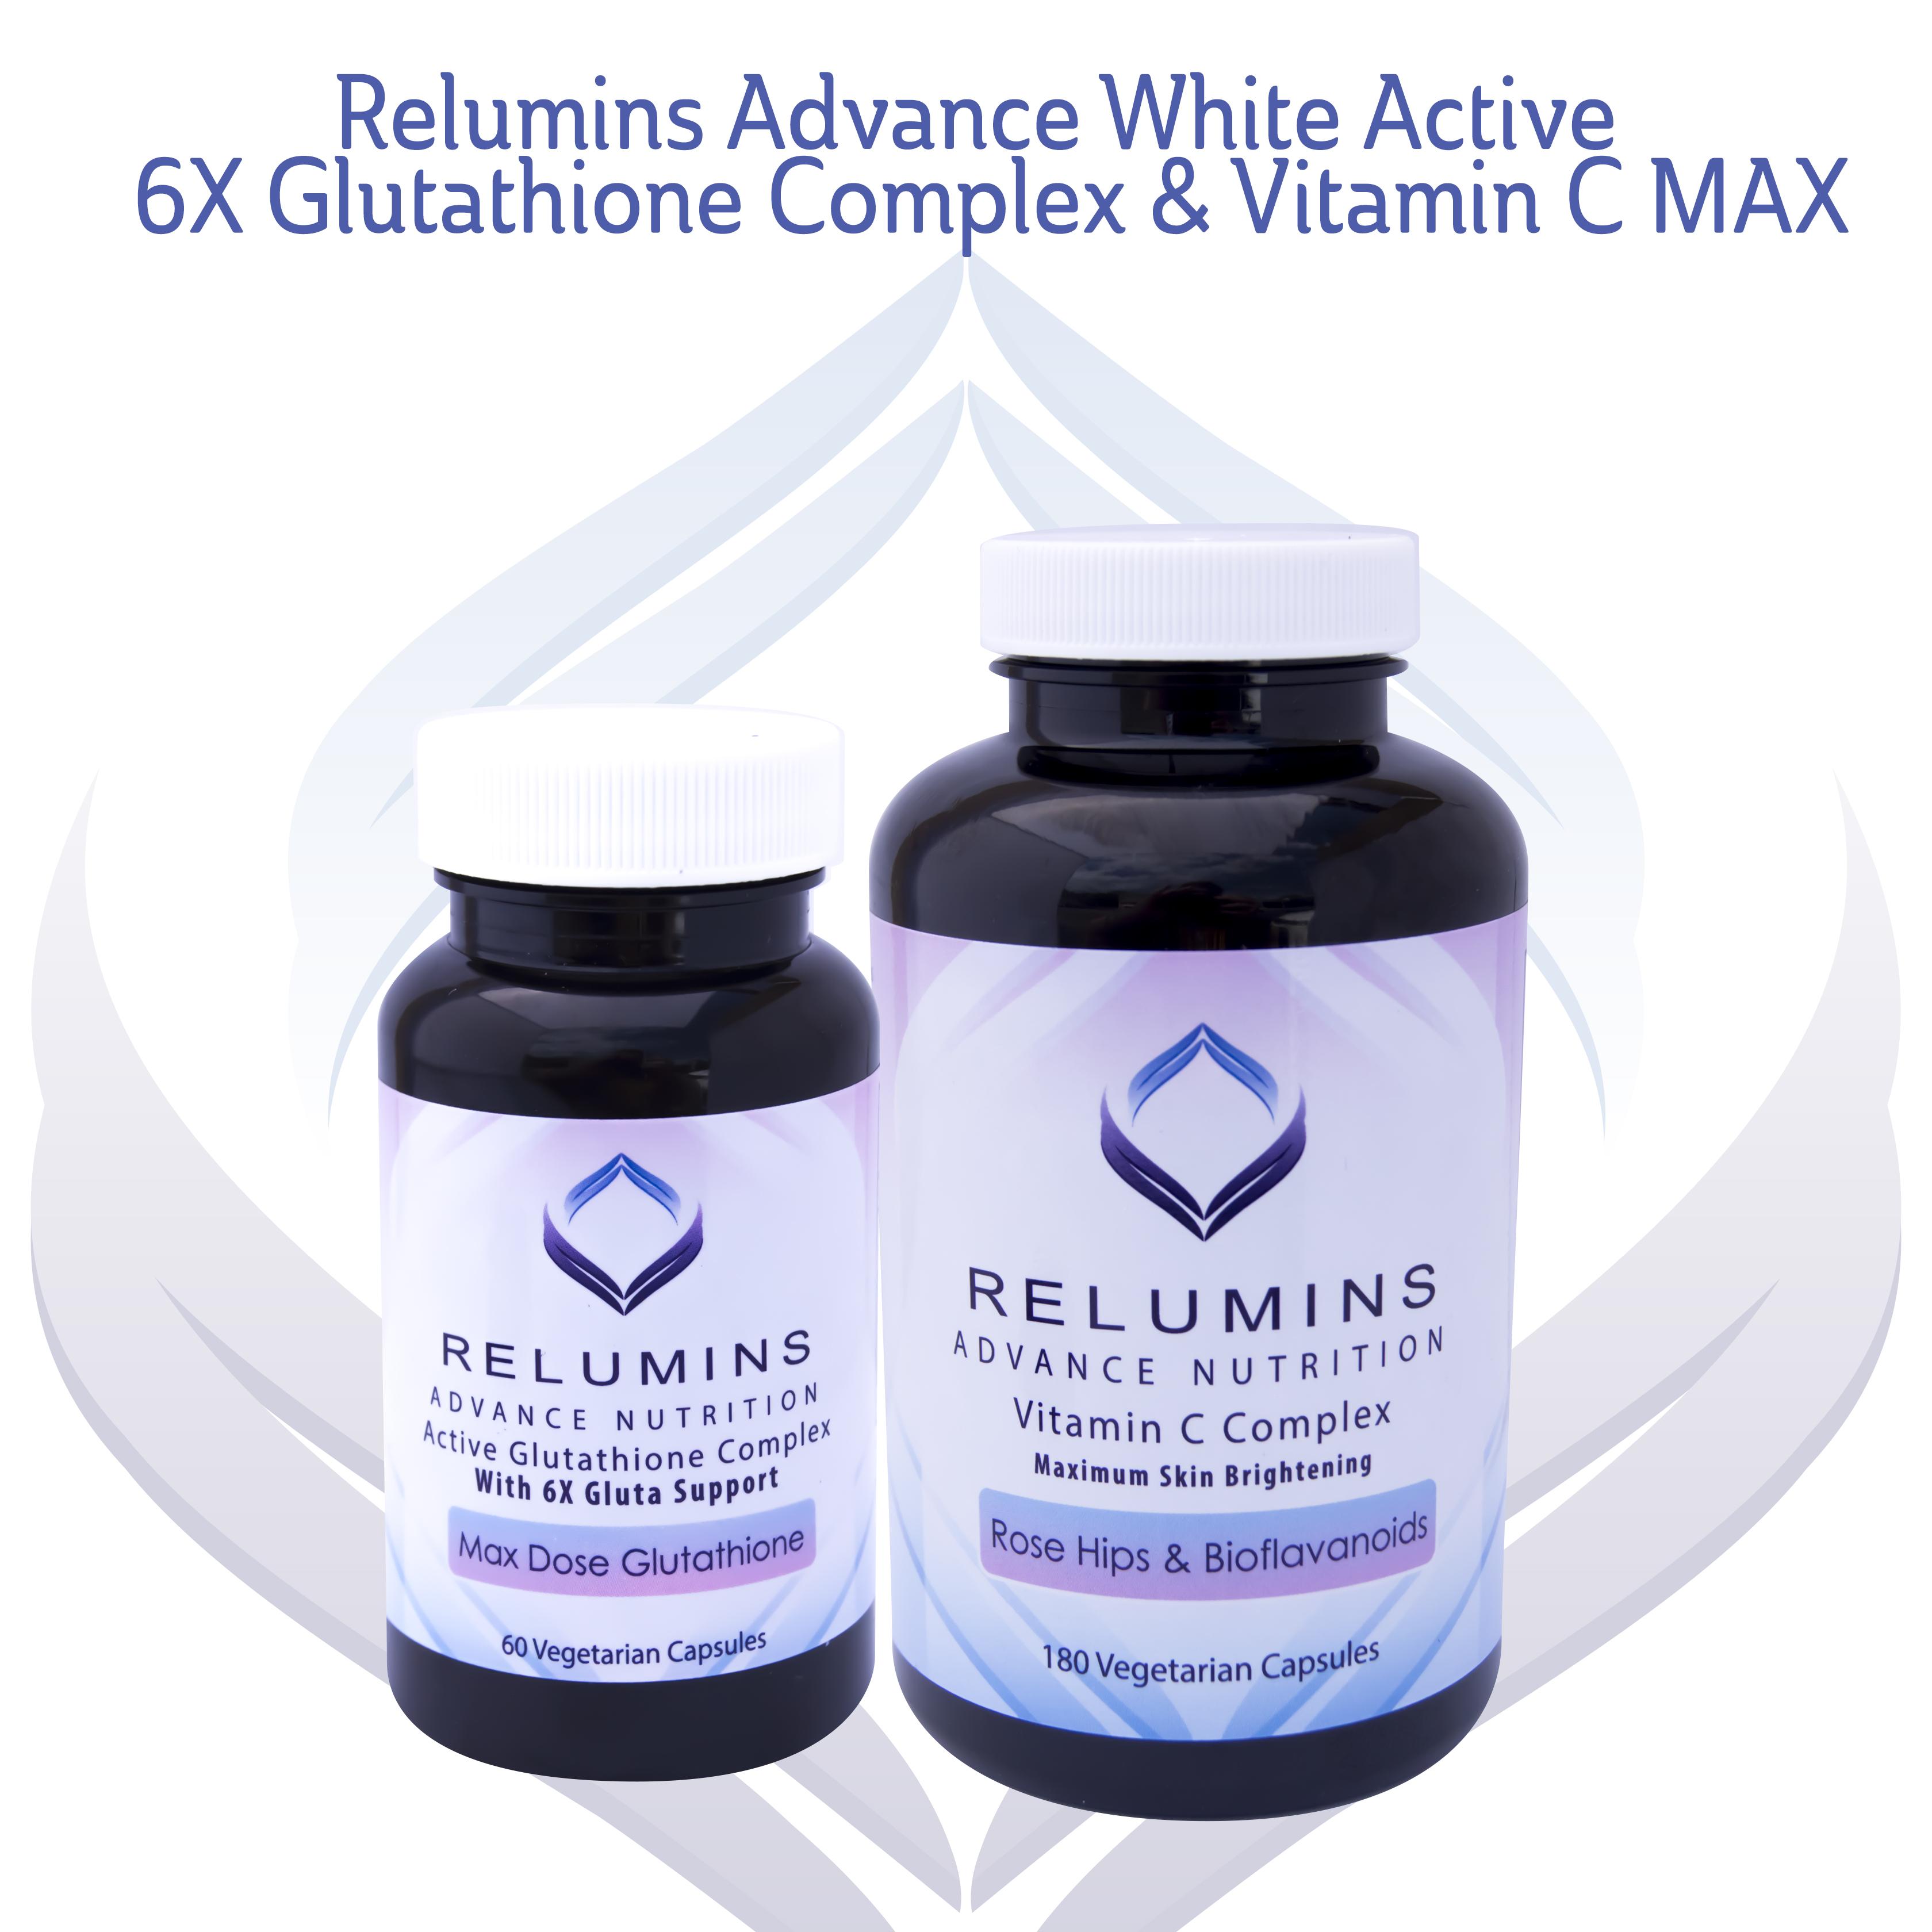 Relumins Advanced Nutrition Active 6x Glutathione Complex Vitamin White C Vit Collagen Quick View